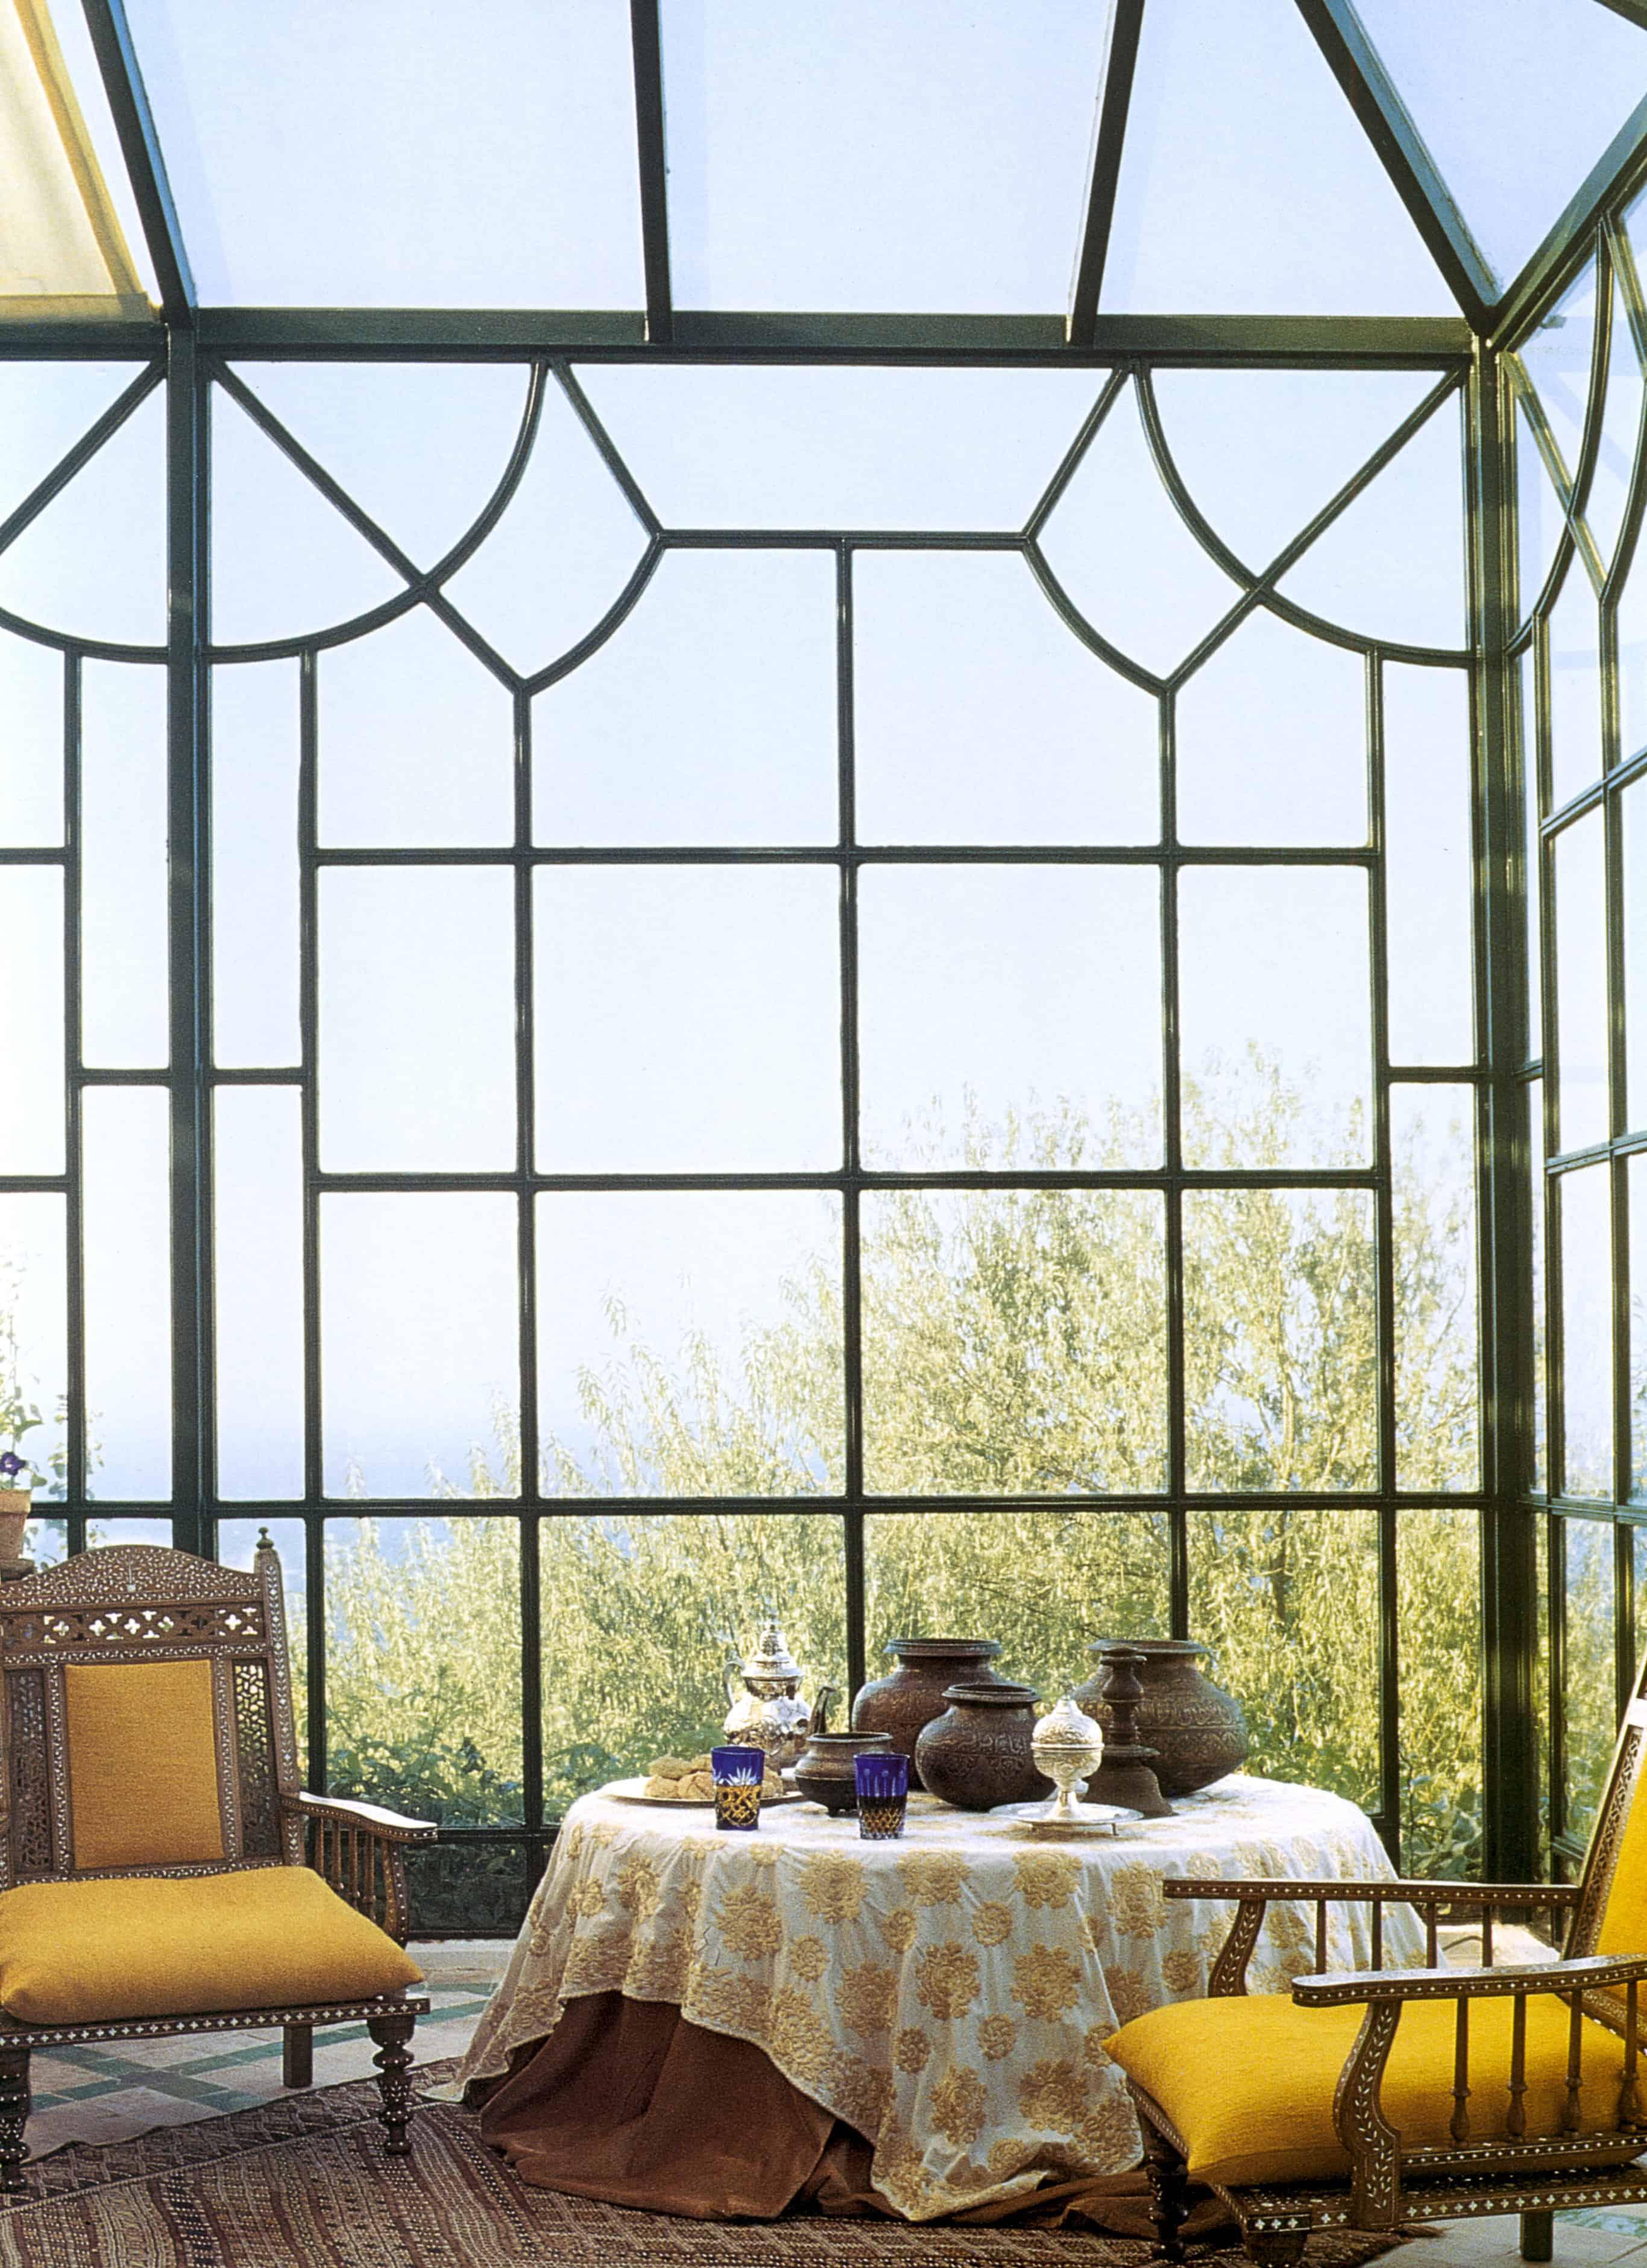 INDOOR Ξ Architecture Solution Hotel Wintergarden